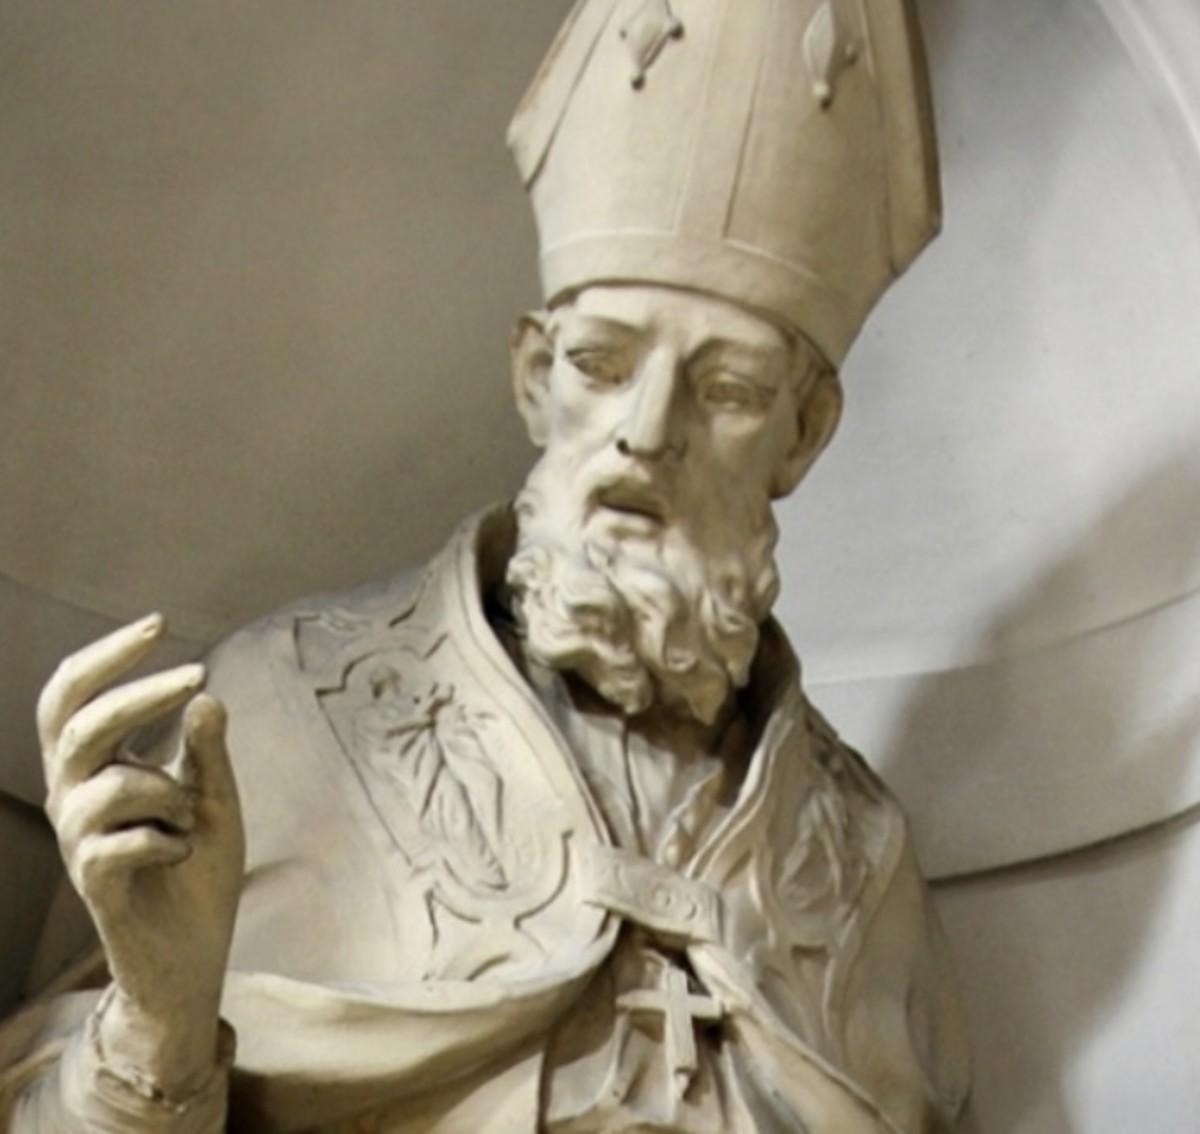 Saint Apollinaris, early Bishop & Martyr of the Catholic Church